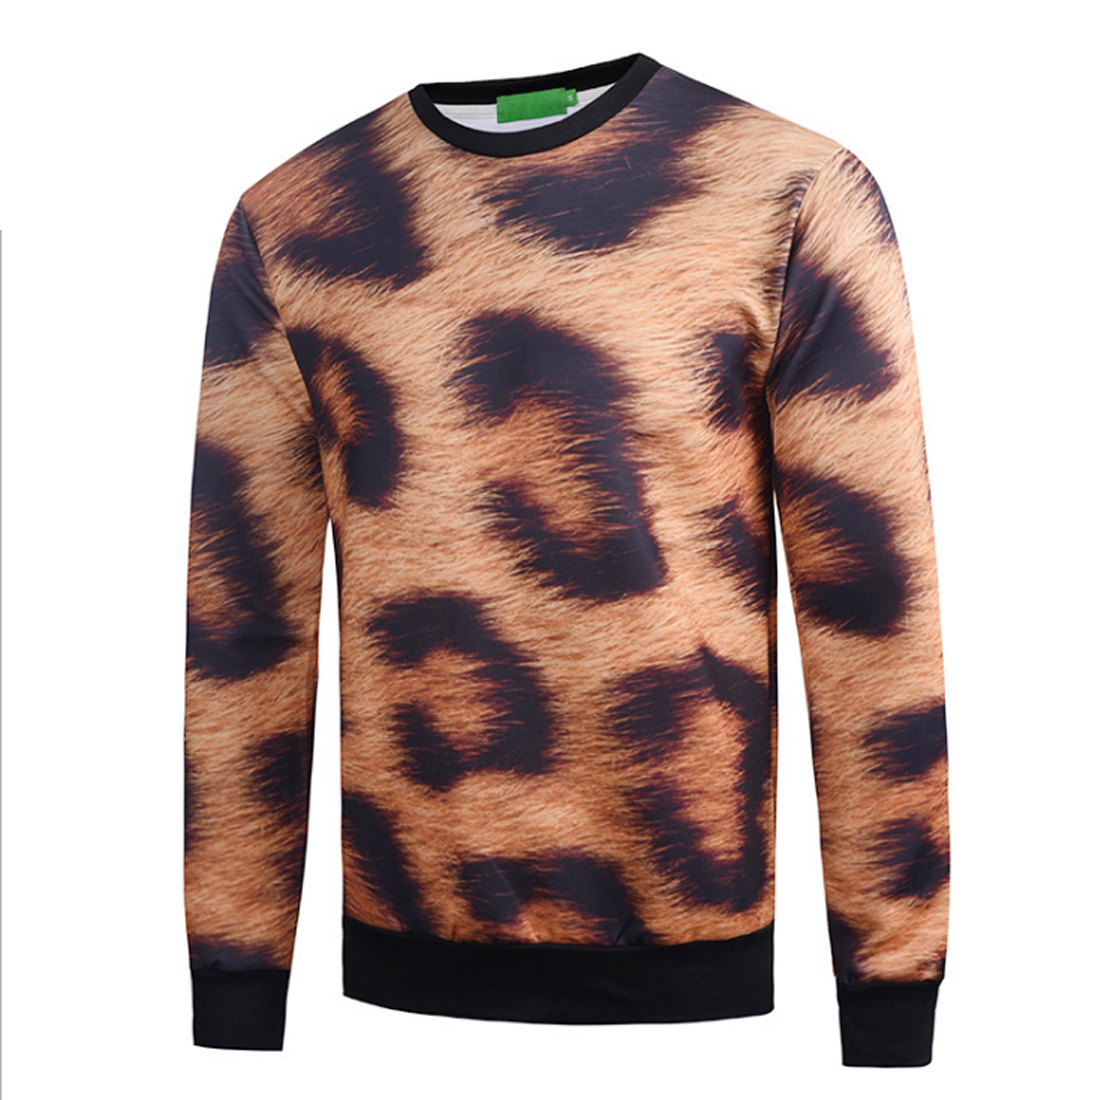 Brand Winter Warm Men Fashion Leopard Hoodies Sweats O-Neck Long Sleeve Sweatshirts Sportswear HOT Pullover Casual Print Clothes